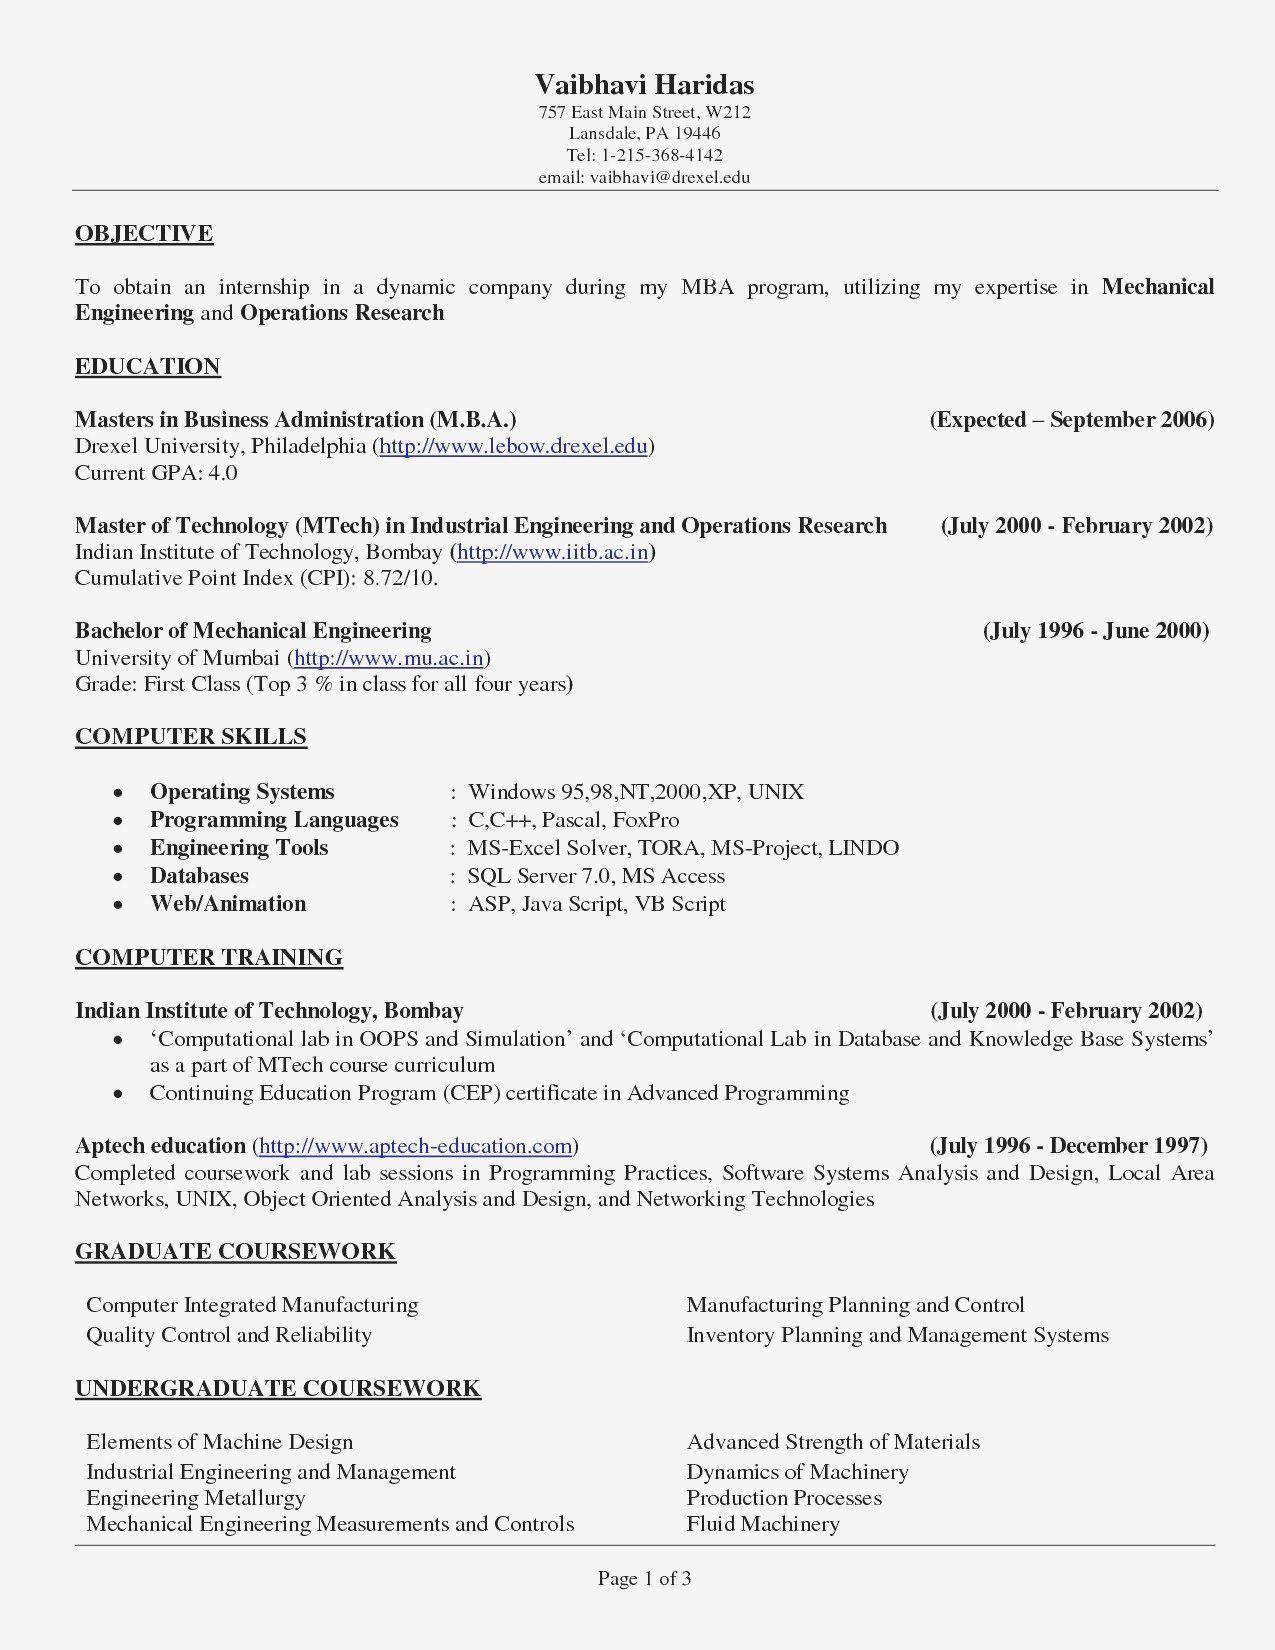 Pre Medical School Resume New 14 Freshman Resume Template Ideas College Resume College Resume Template Student Resume Template